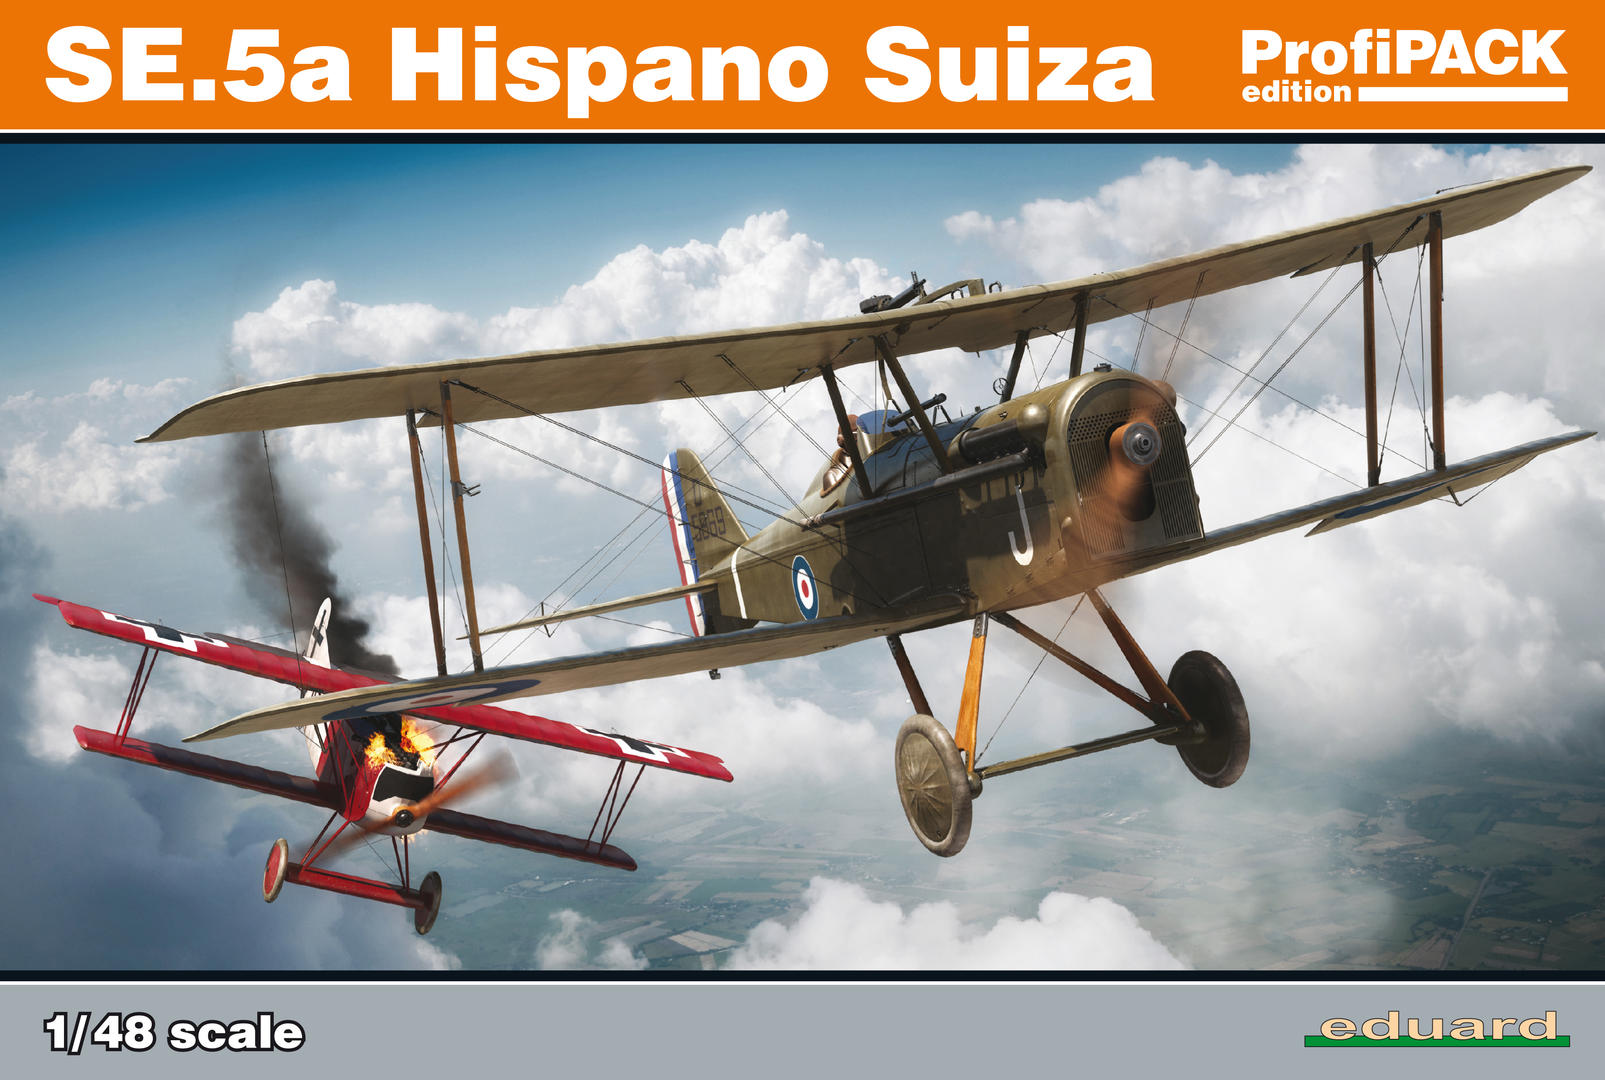 Eduard82132-SE.5a-Hispano-Suiza-PROFIPACK-Deckelbild SE.5a Hispano Suiza in 1:48 als PROFIPACK-Edition (Eduard 82132)